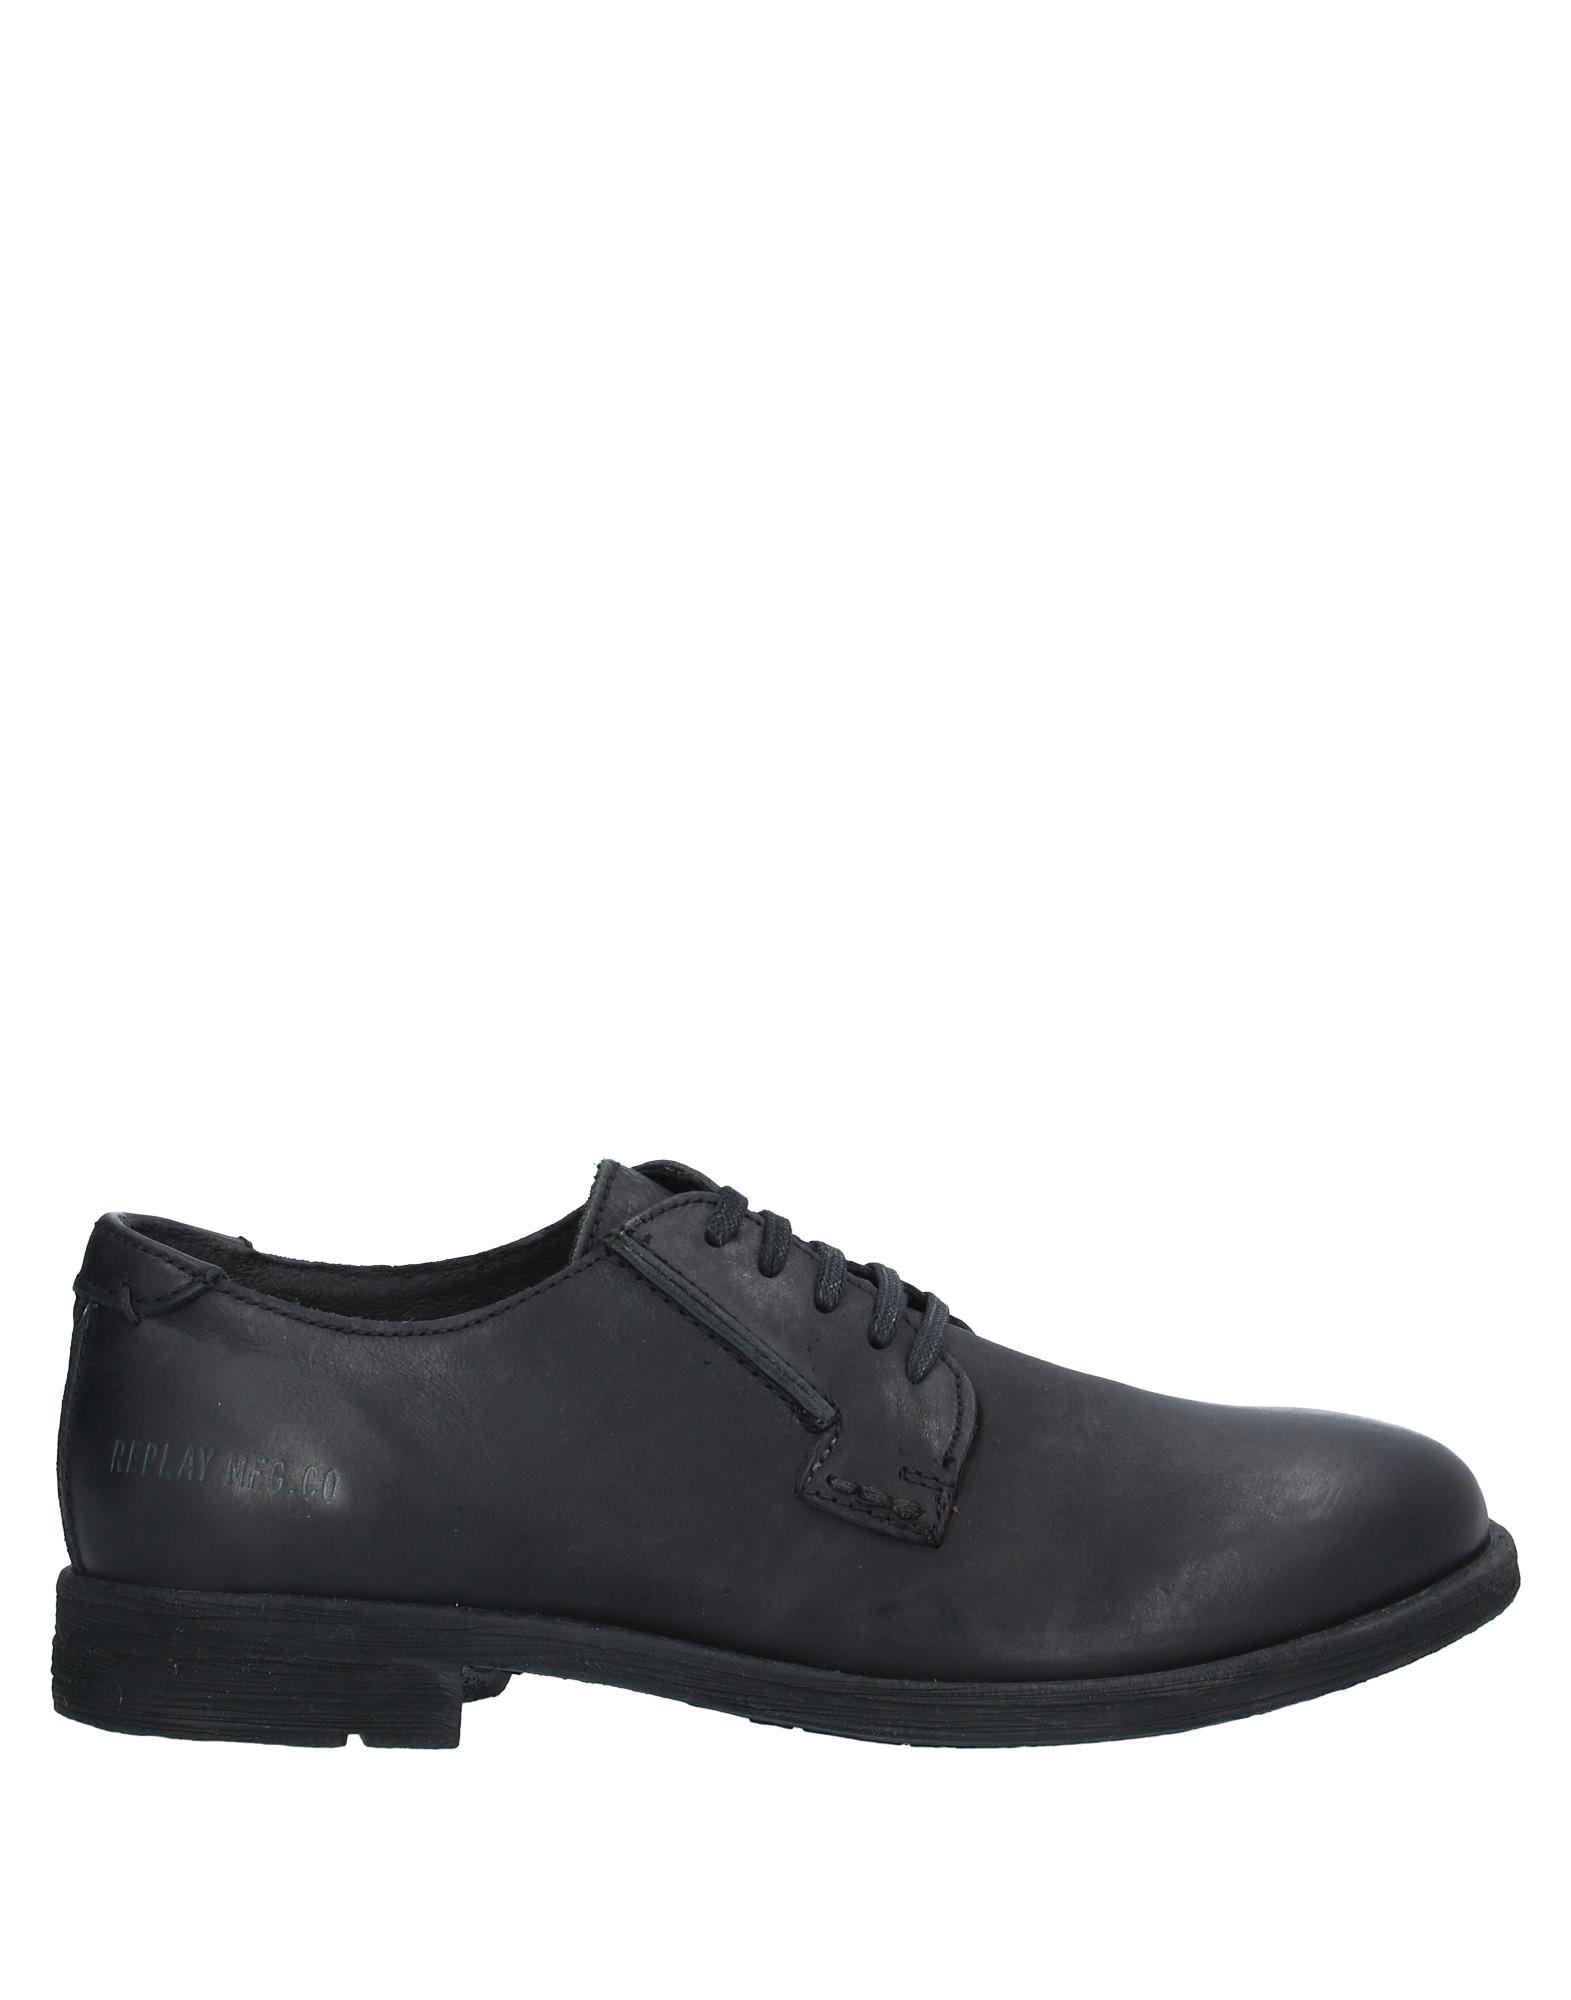 REPLAY Обувь на шнурках wys watch your step обувь на шнурках